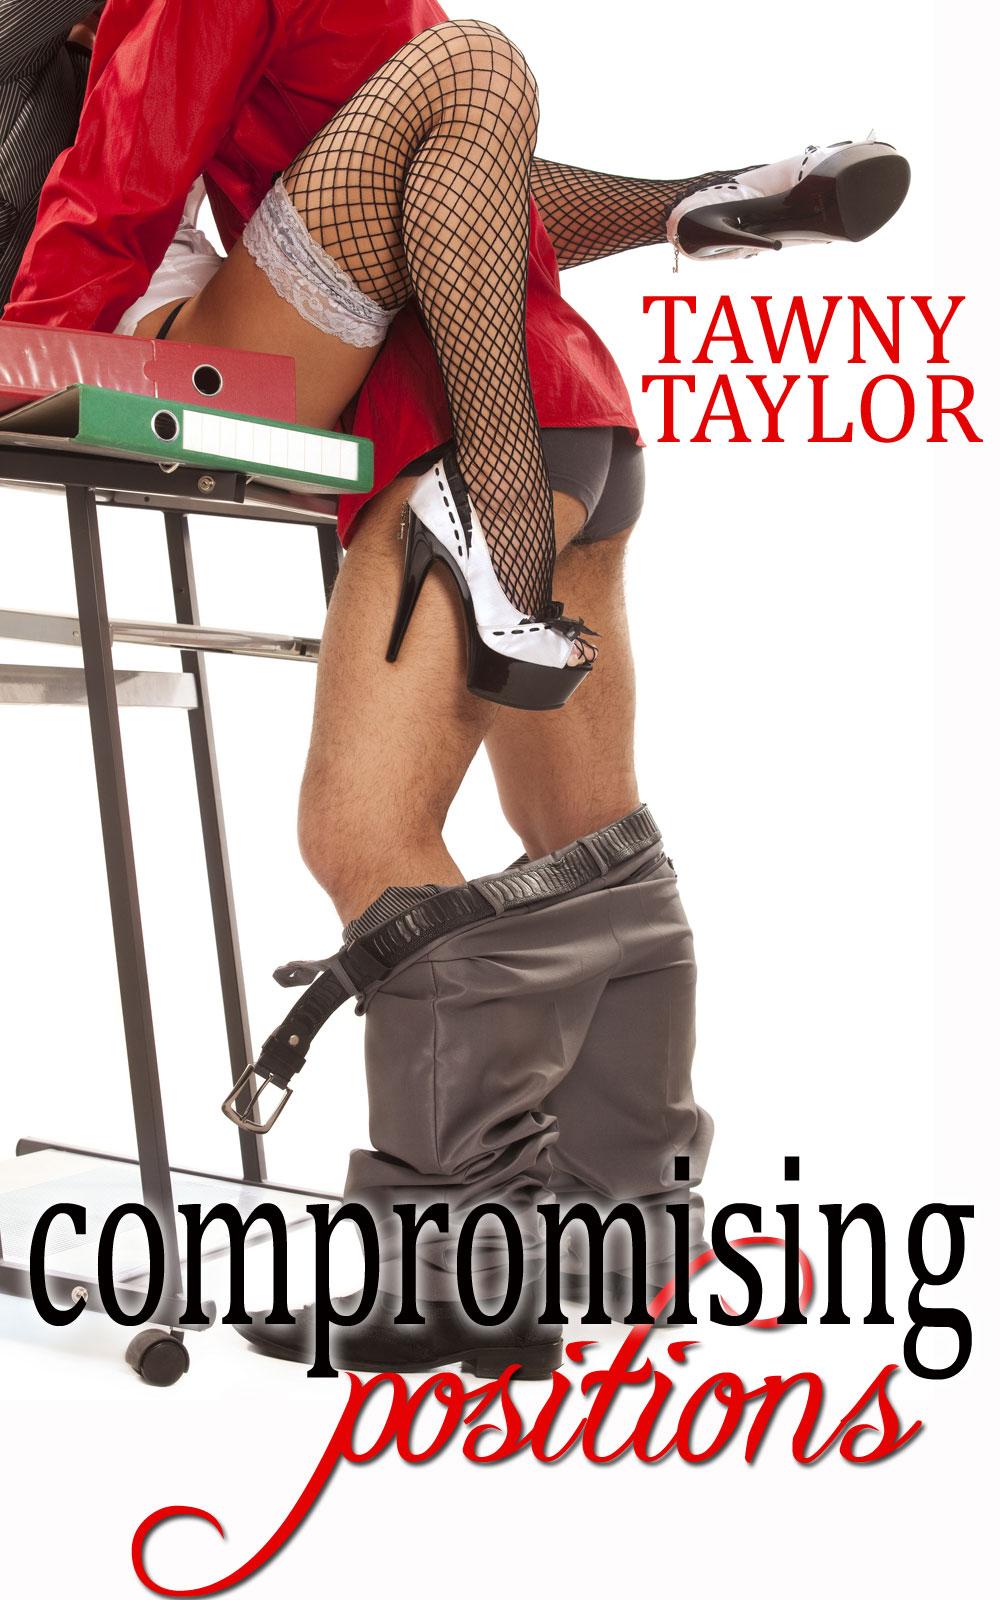 Compromising Positions (Lesbian Erotica)